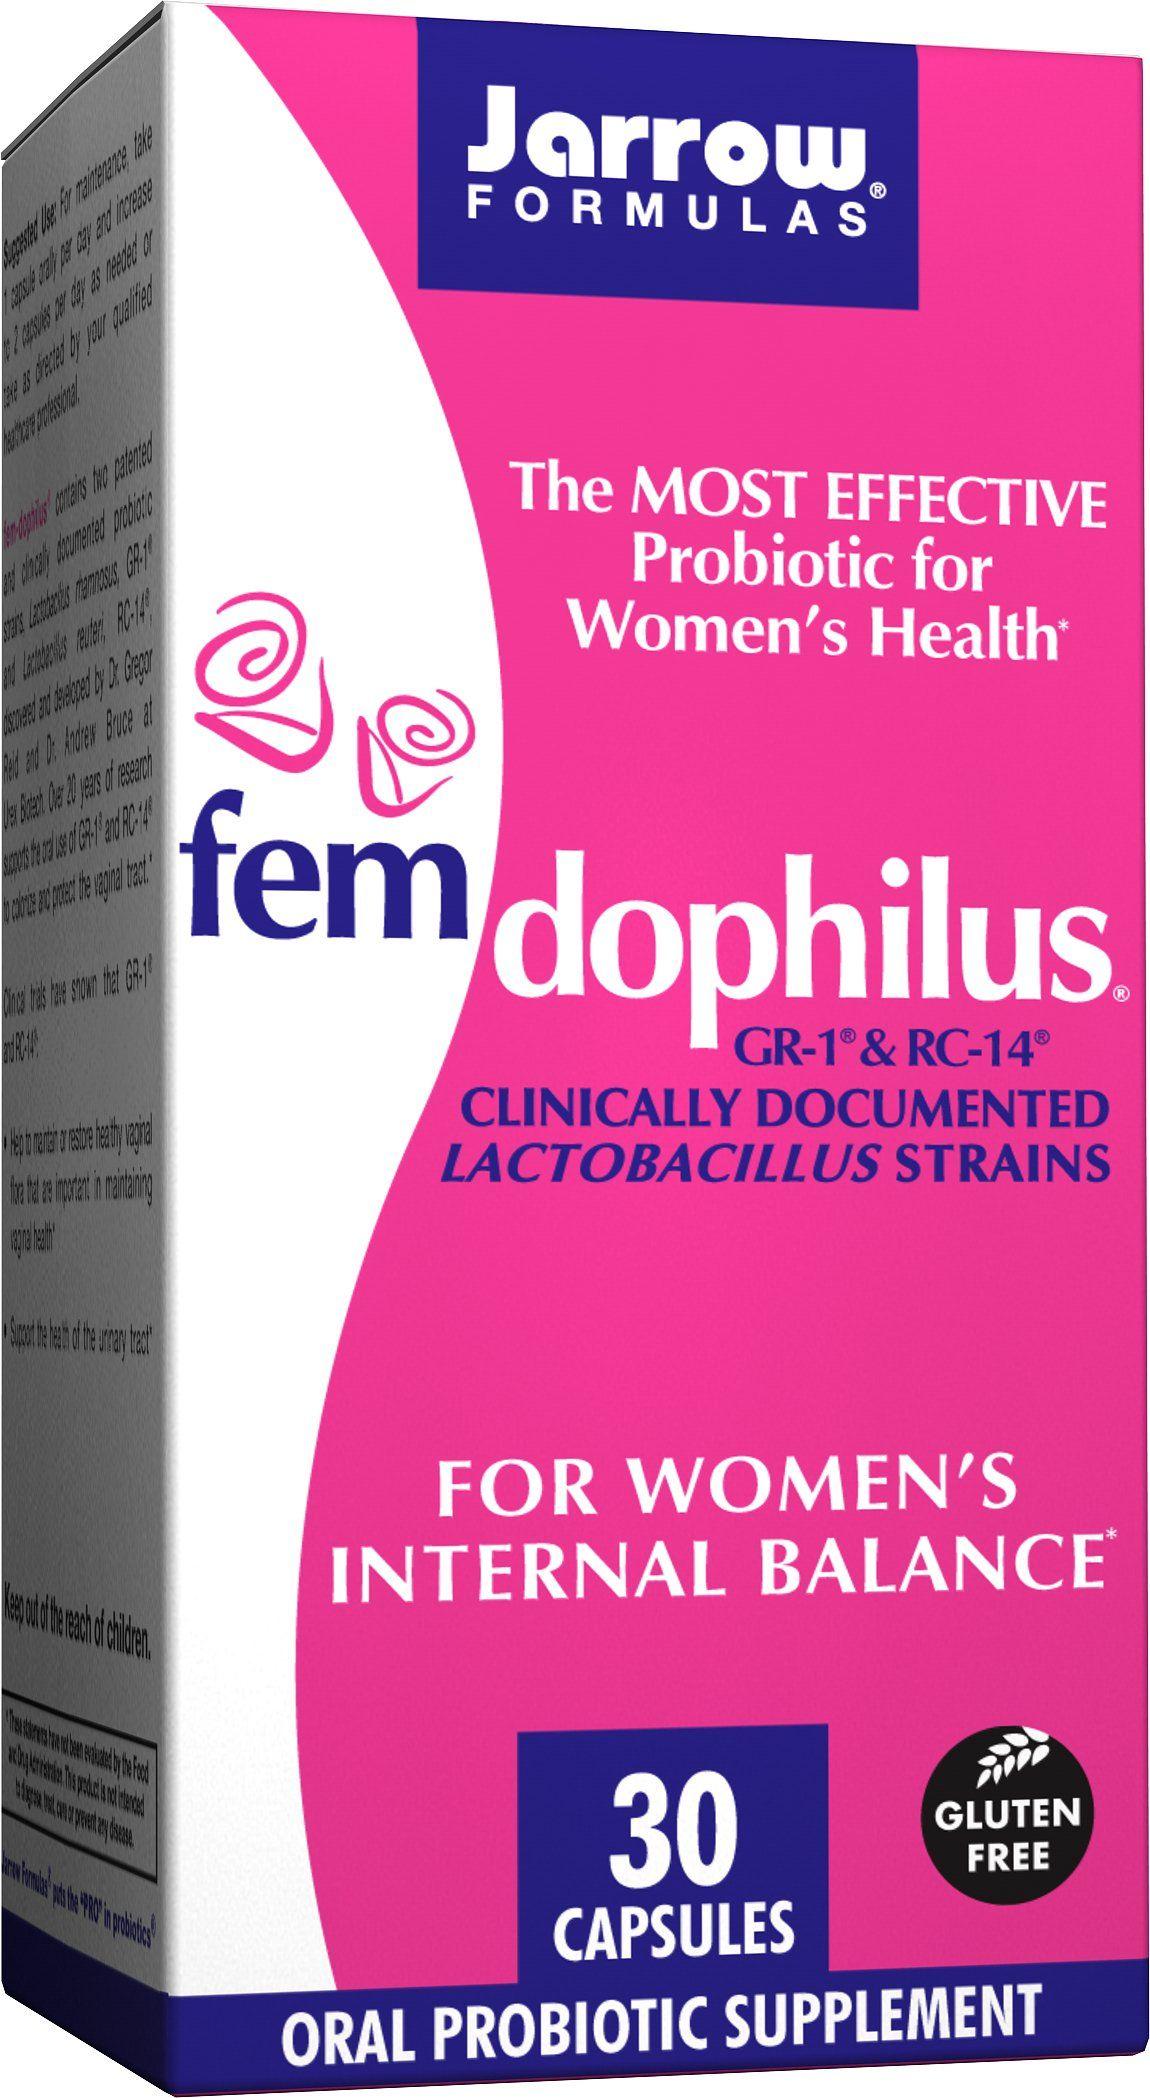 Fem dophilus bacterial vaginosis